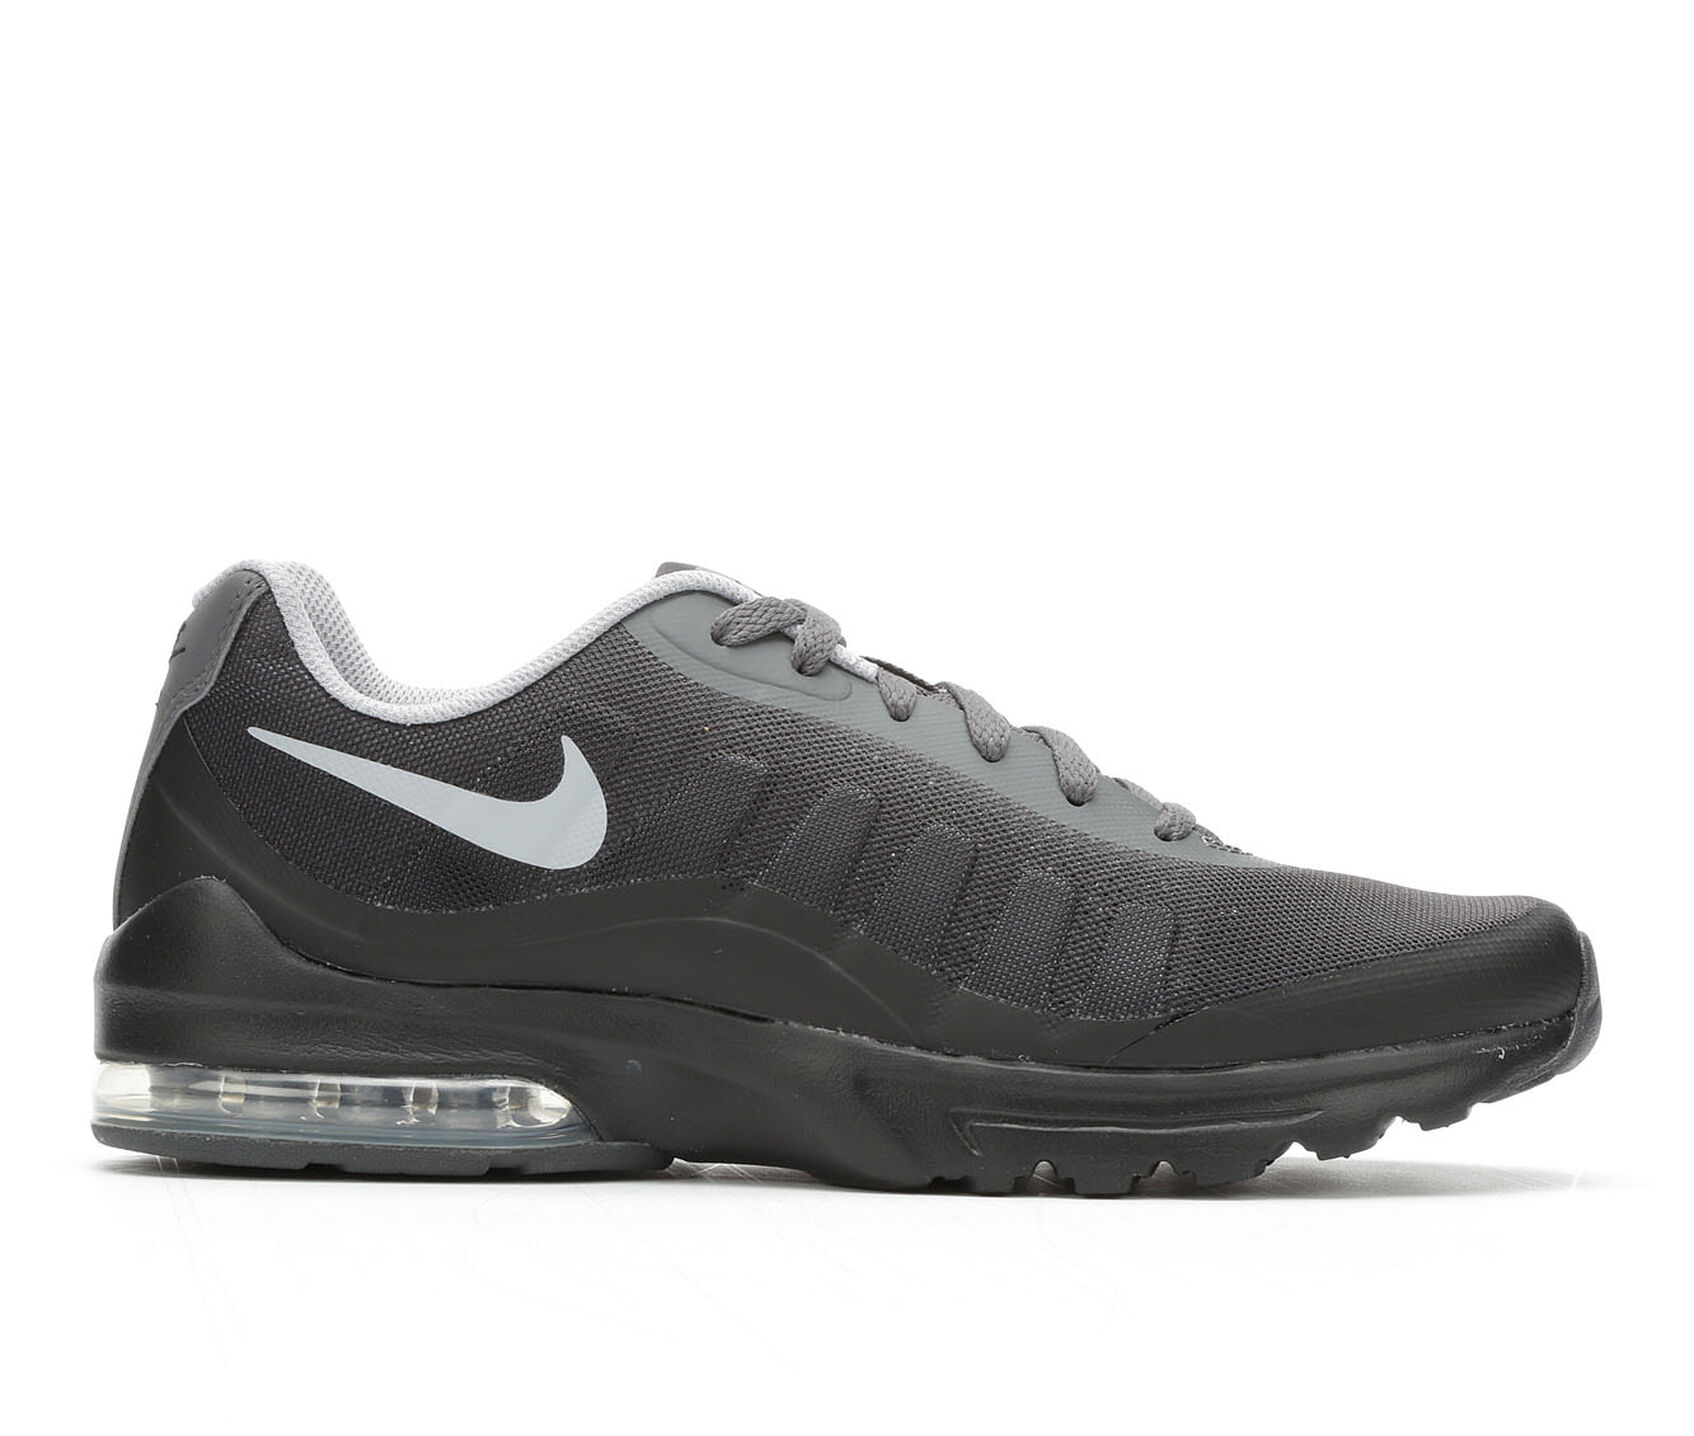 pretty nice 0e81f 5cd36 Men  39 s Nike Air Max Invigor Print Athletic Sneakers. Carousel Controls  Previous